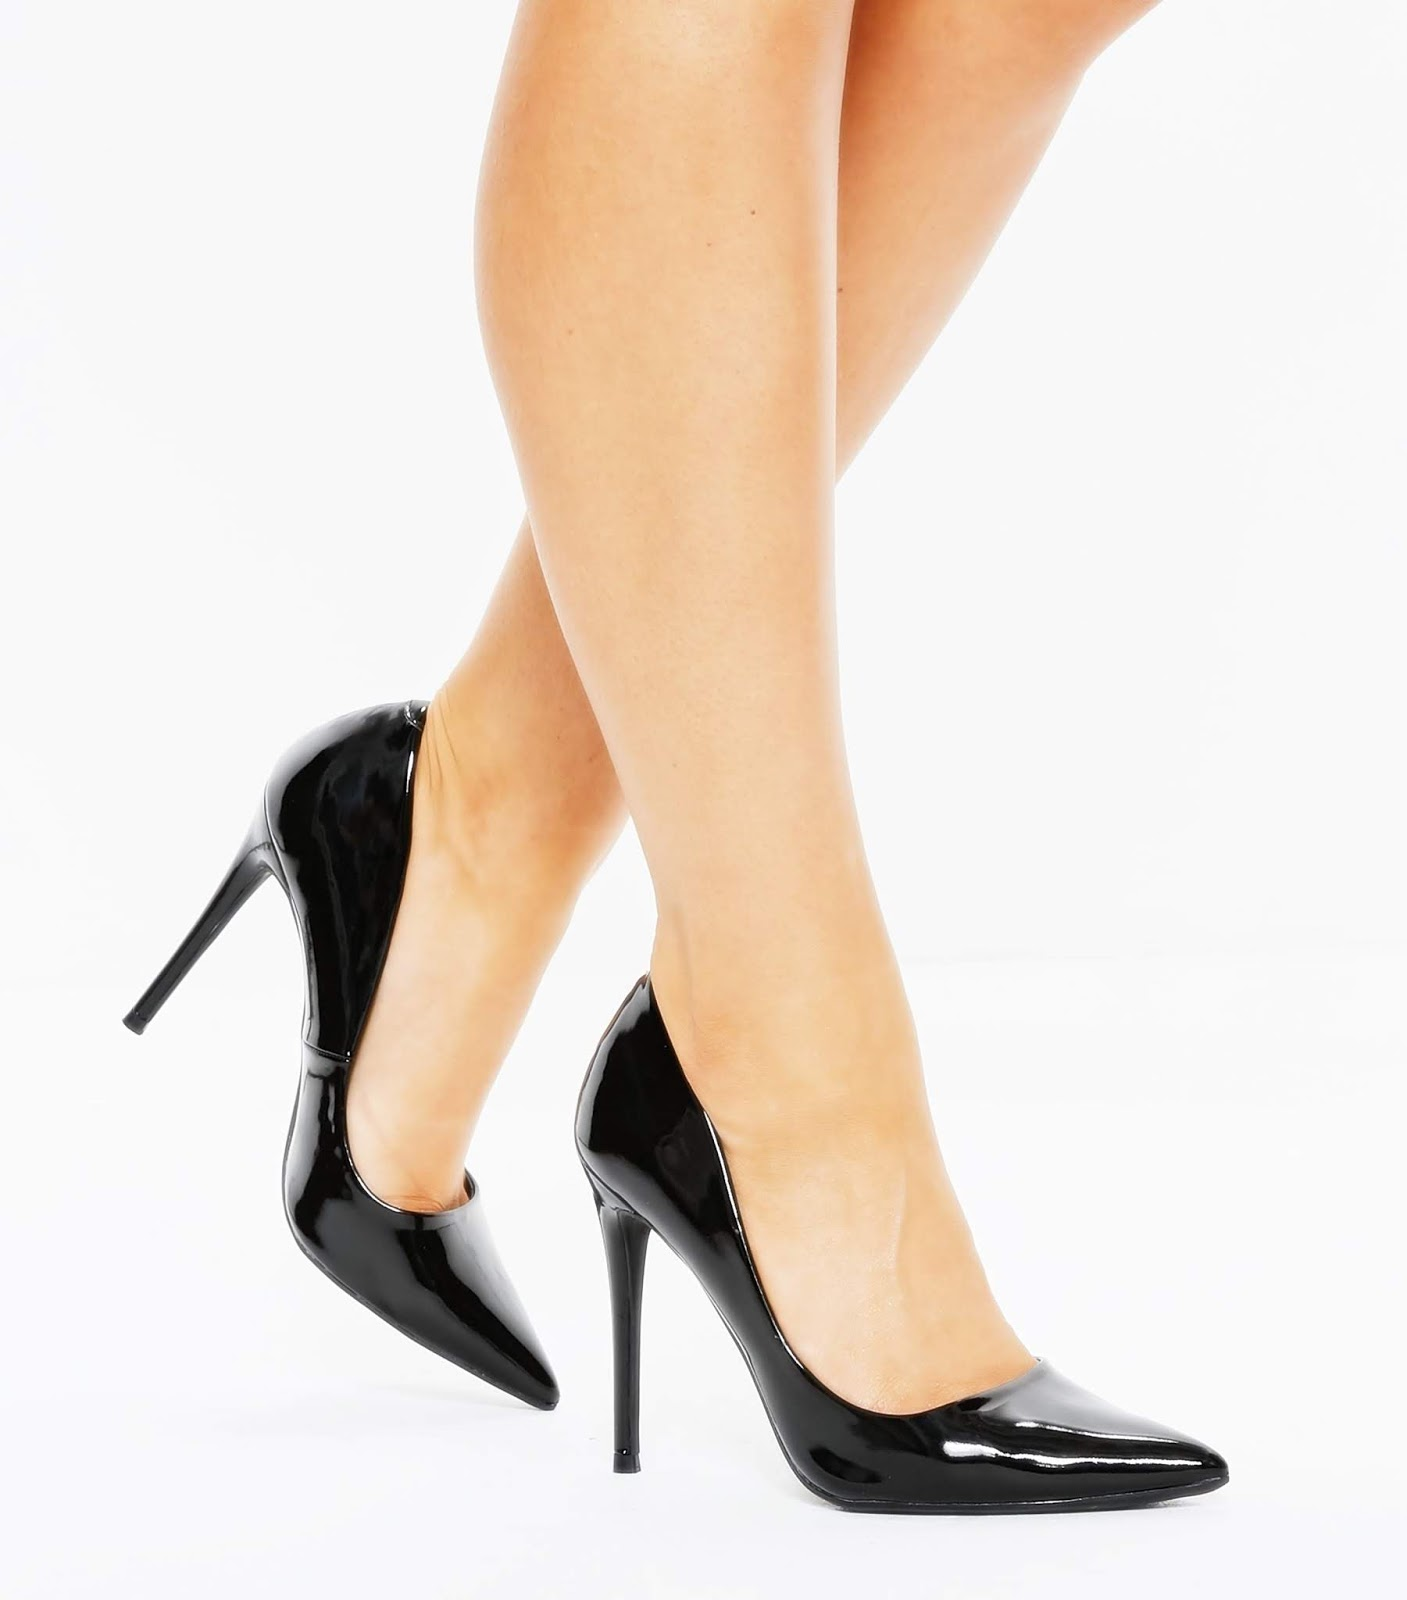 Gambar - tips nyaman memakai high heels